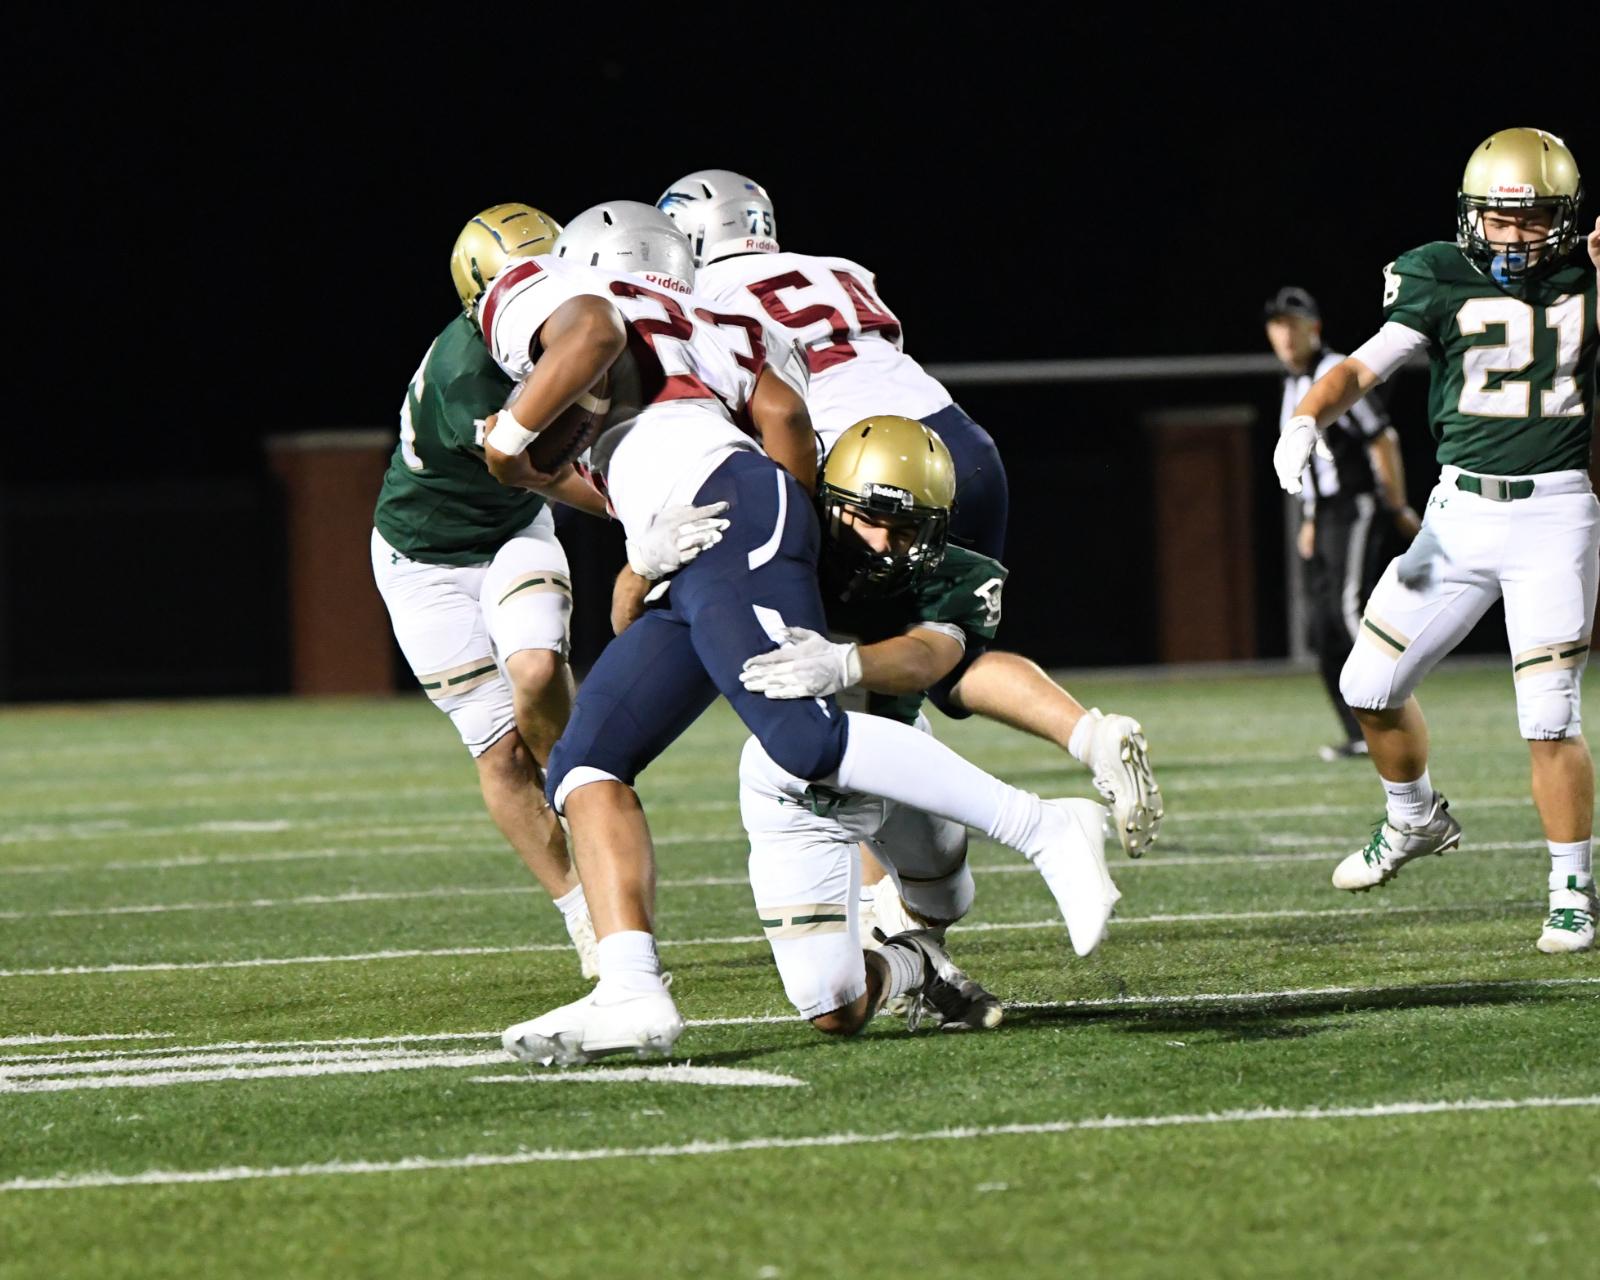 Photo Gallery: B-team Football vs White Knoll 11-5-20